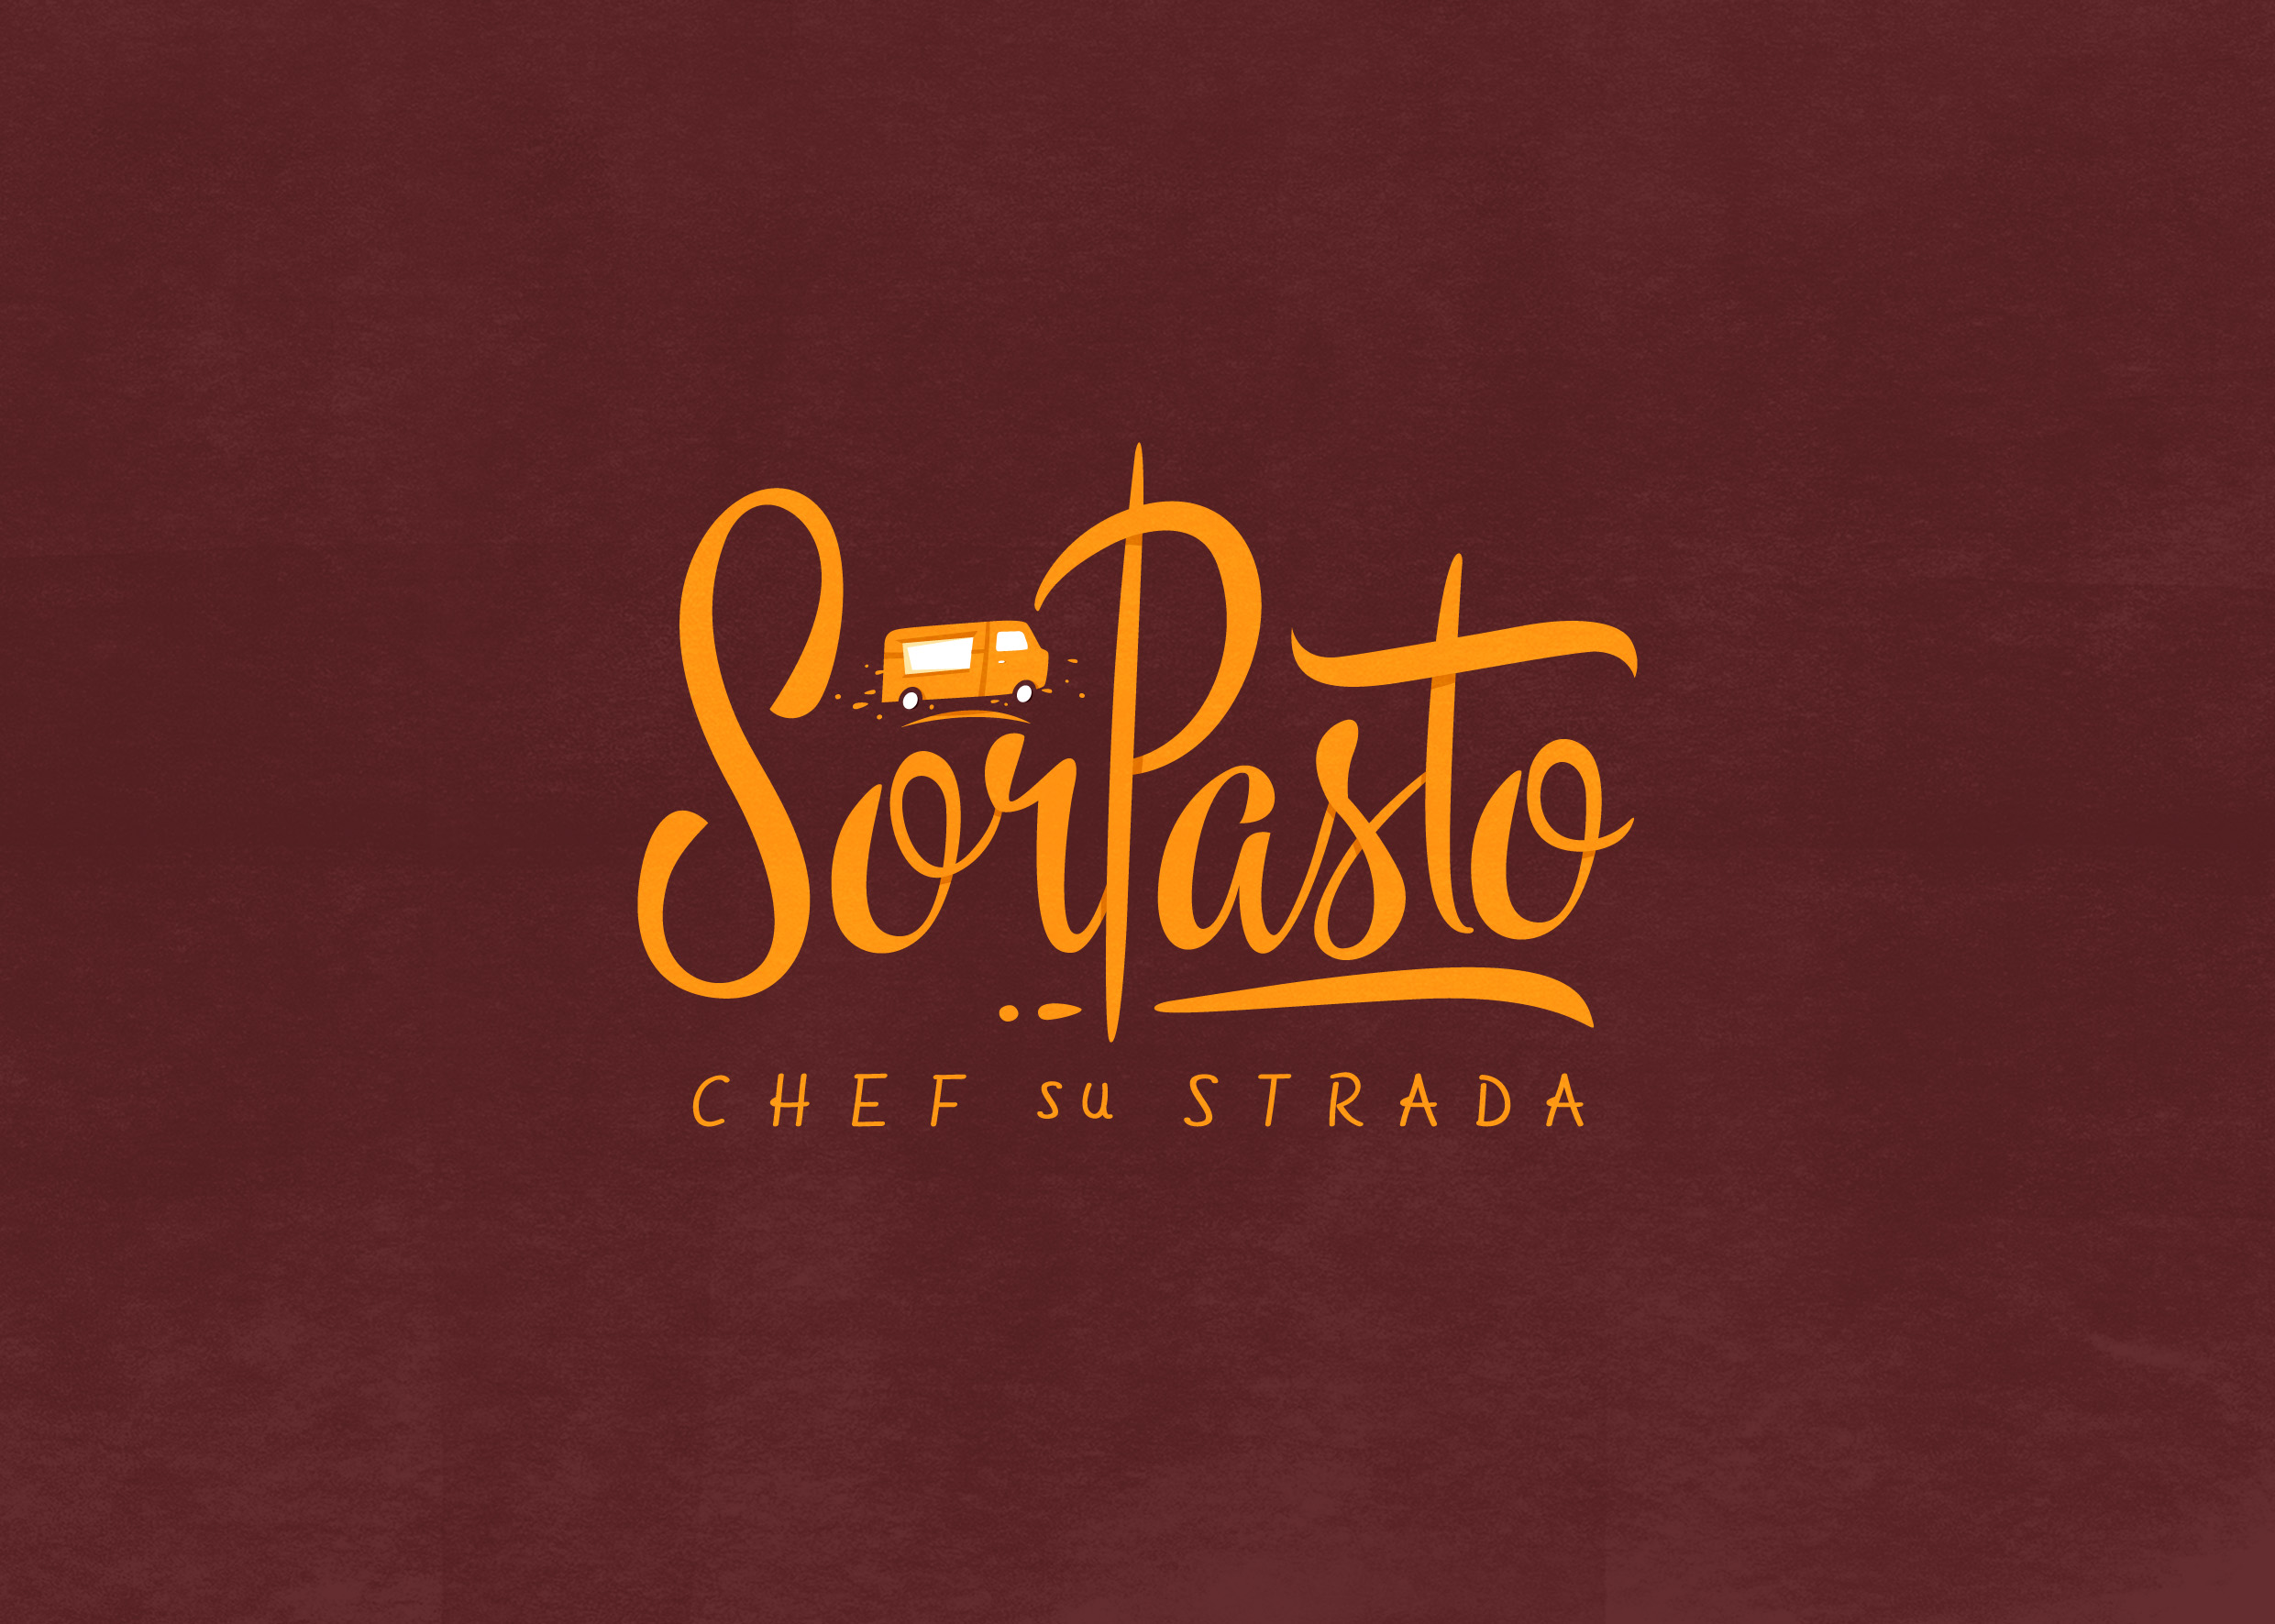 Logo_Negativo_Colore_Sorpasto.jpg